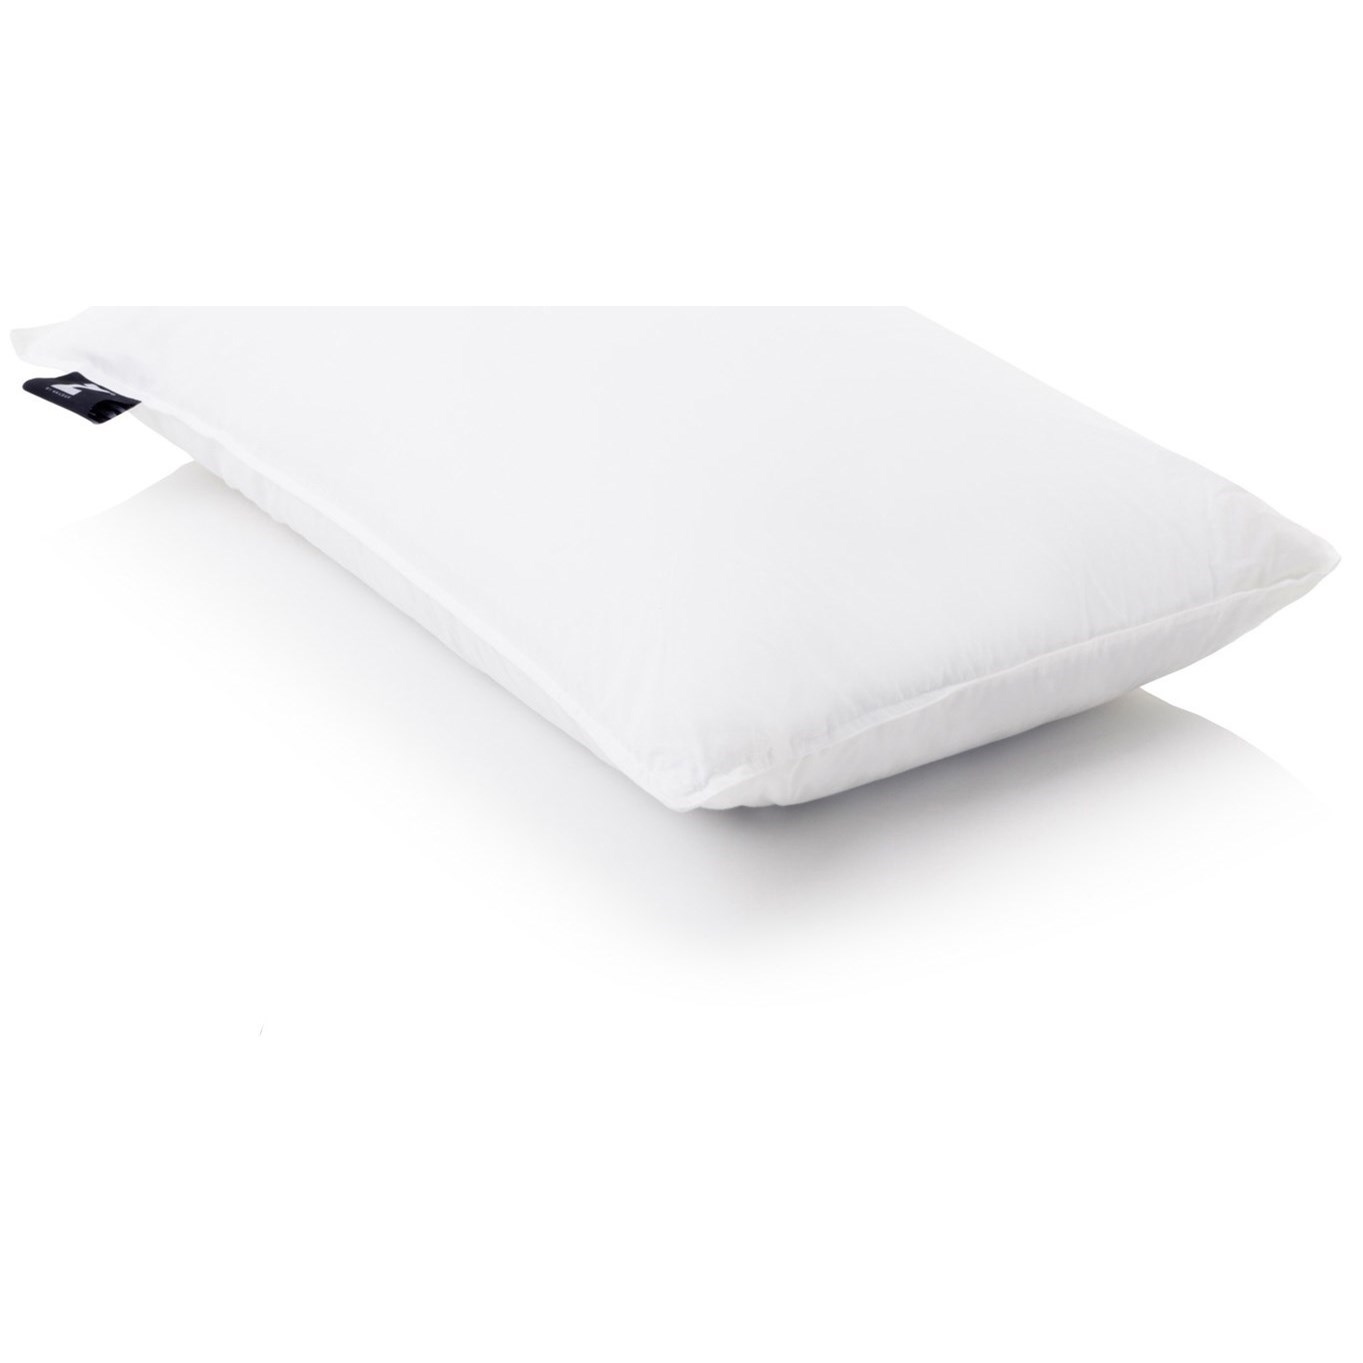 Malouf Gelled Microfiber King Gelled Microfiber Pillow - Item Number: ZZKK00GM